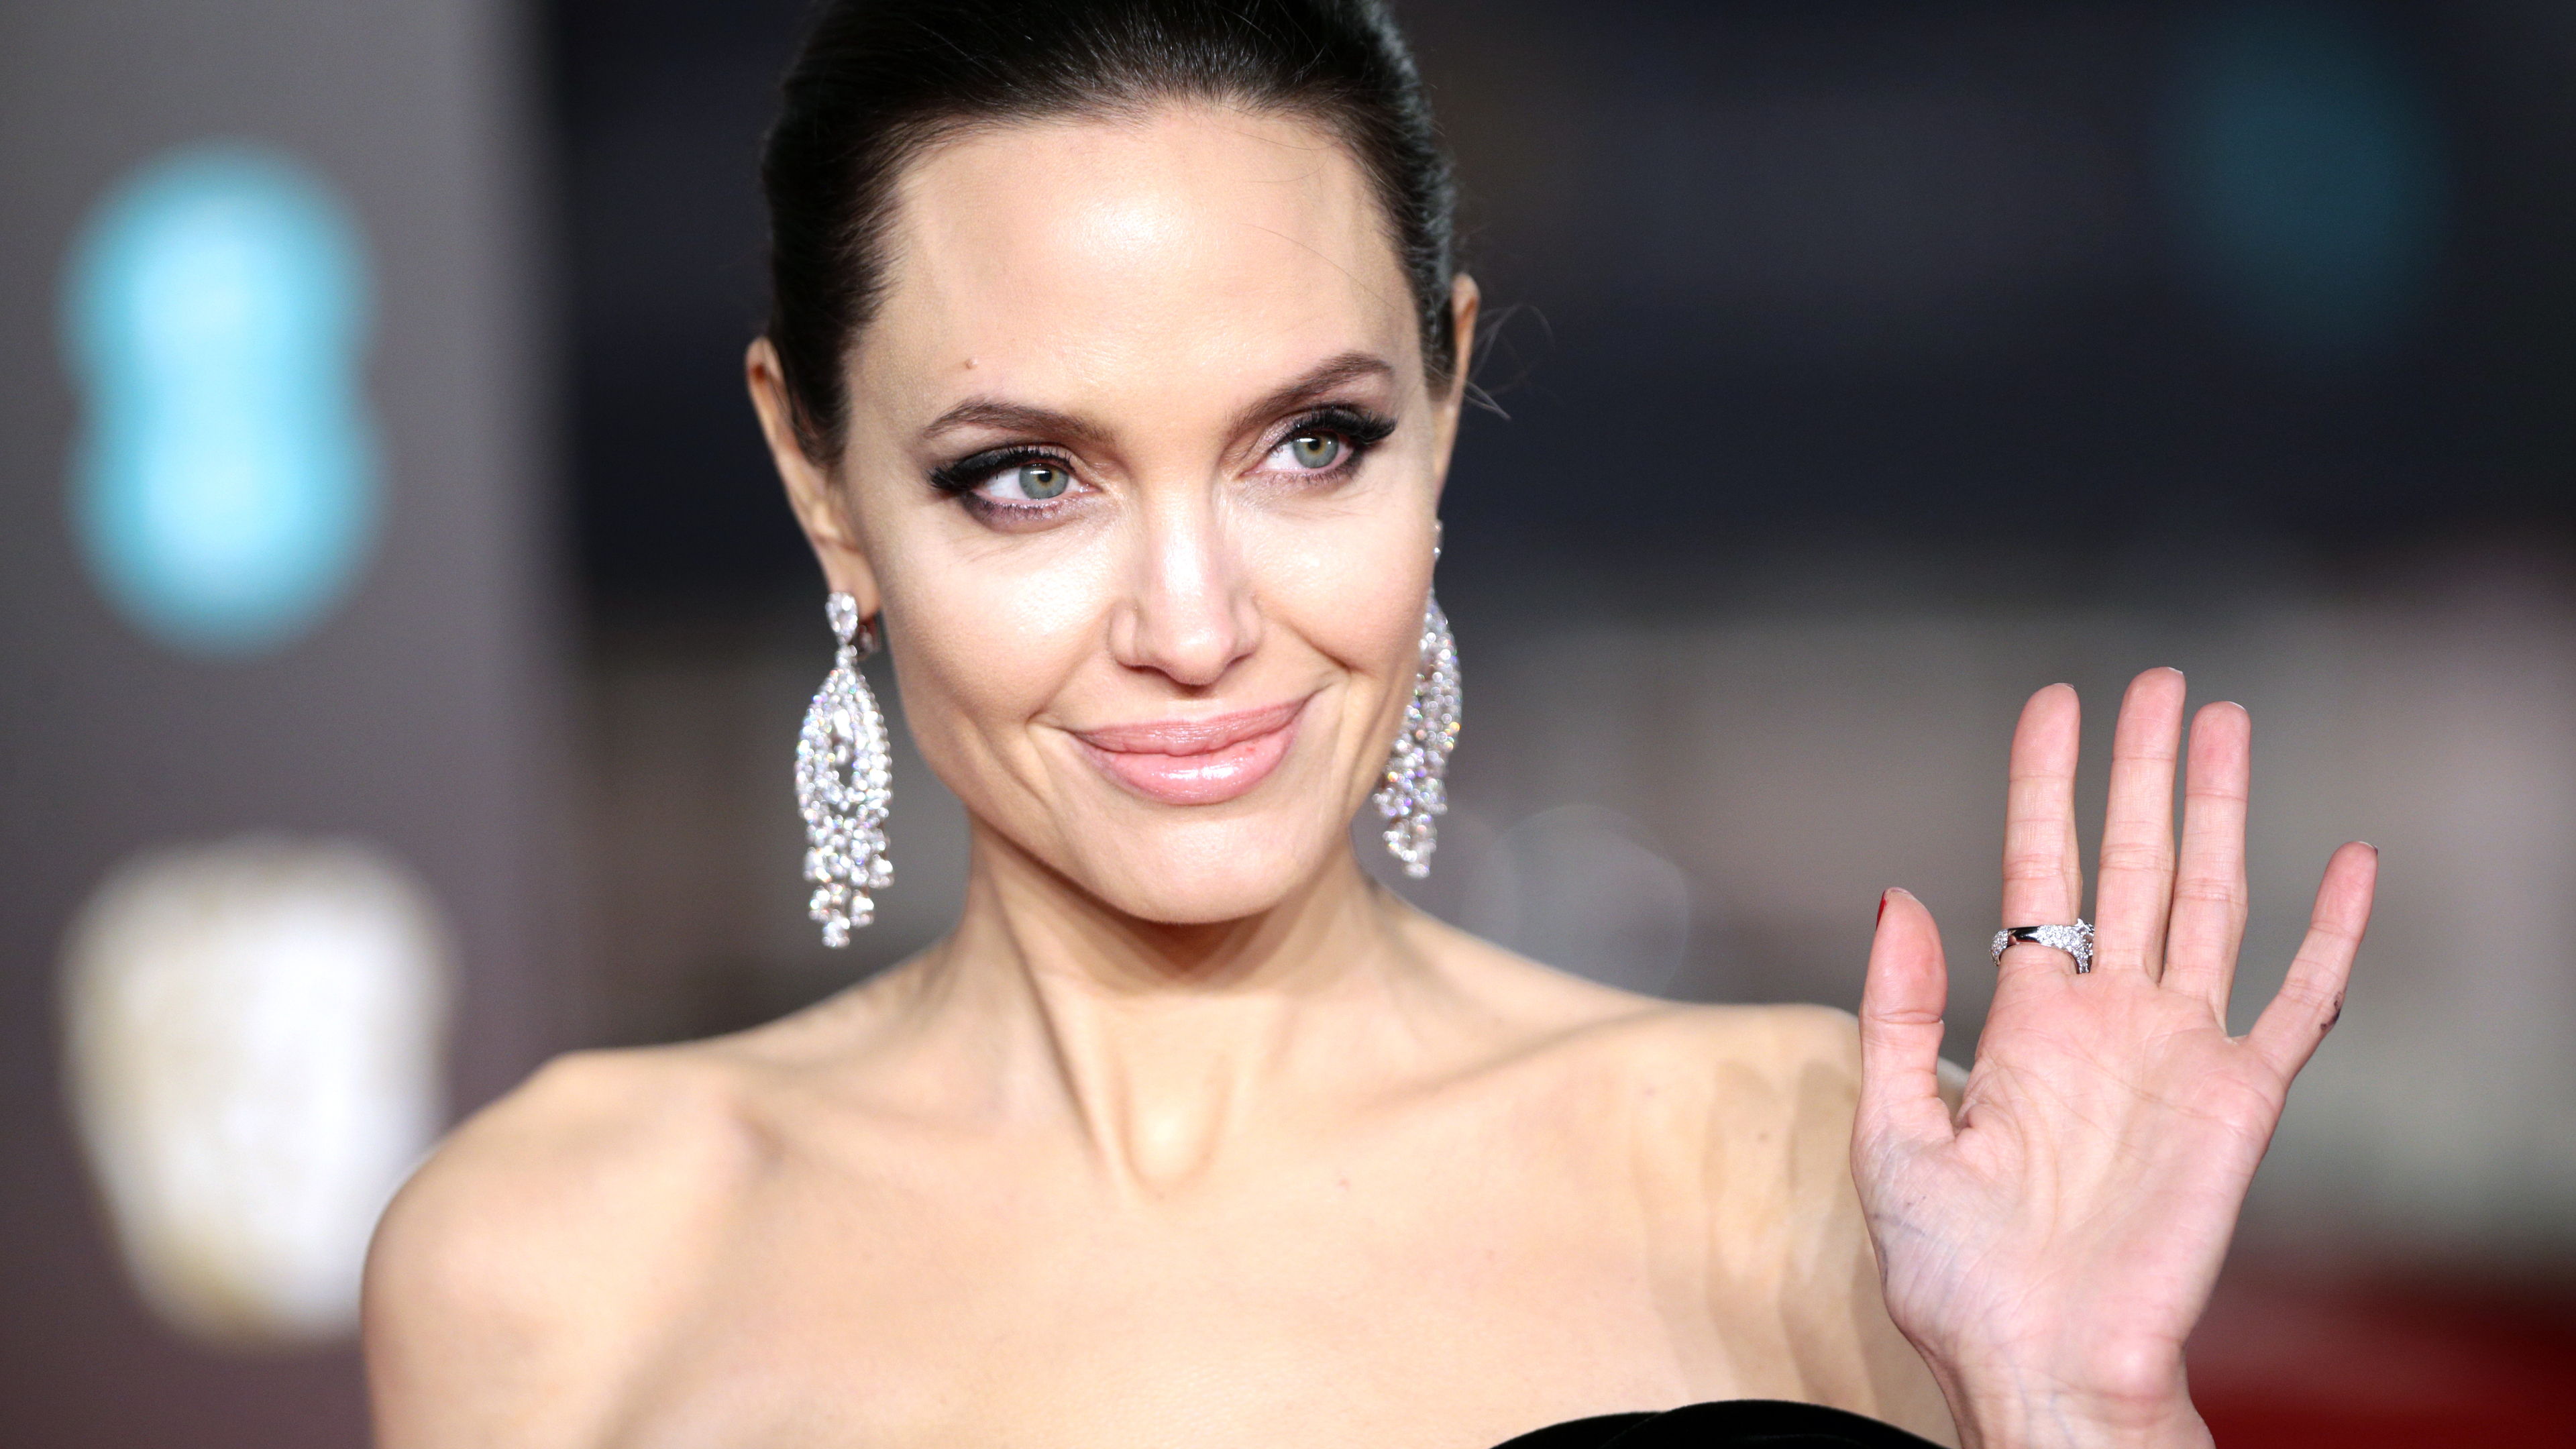 angelina jolie 2019 1536863857 - Angelina Jolie 2019 - hd-wallpapers, girls wallpapers, celebrities wallpapers, angelina jolie wallpapers, 5k wallpapers, 4k-wallpapers